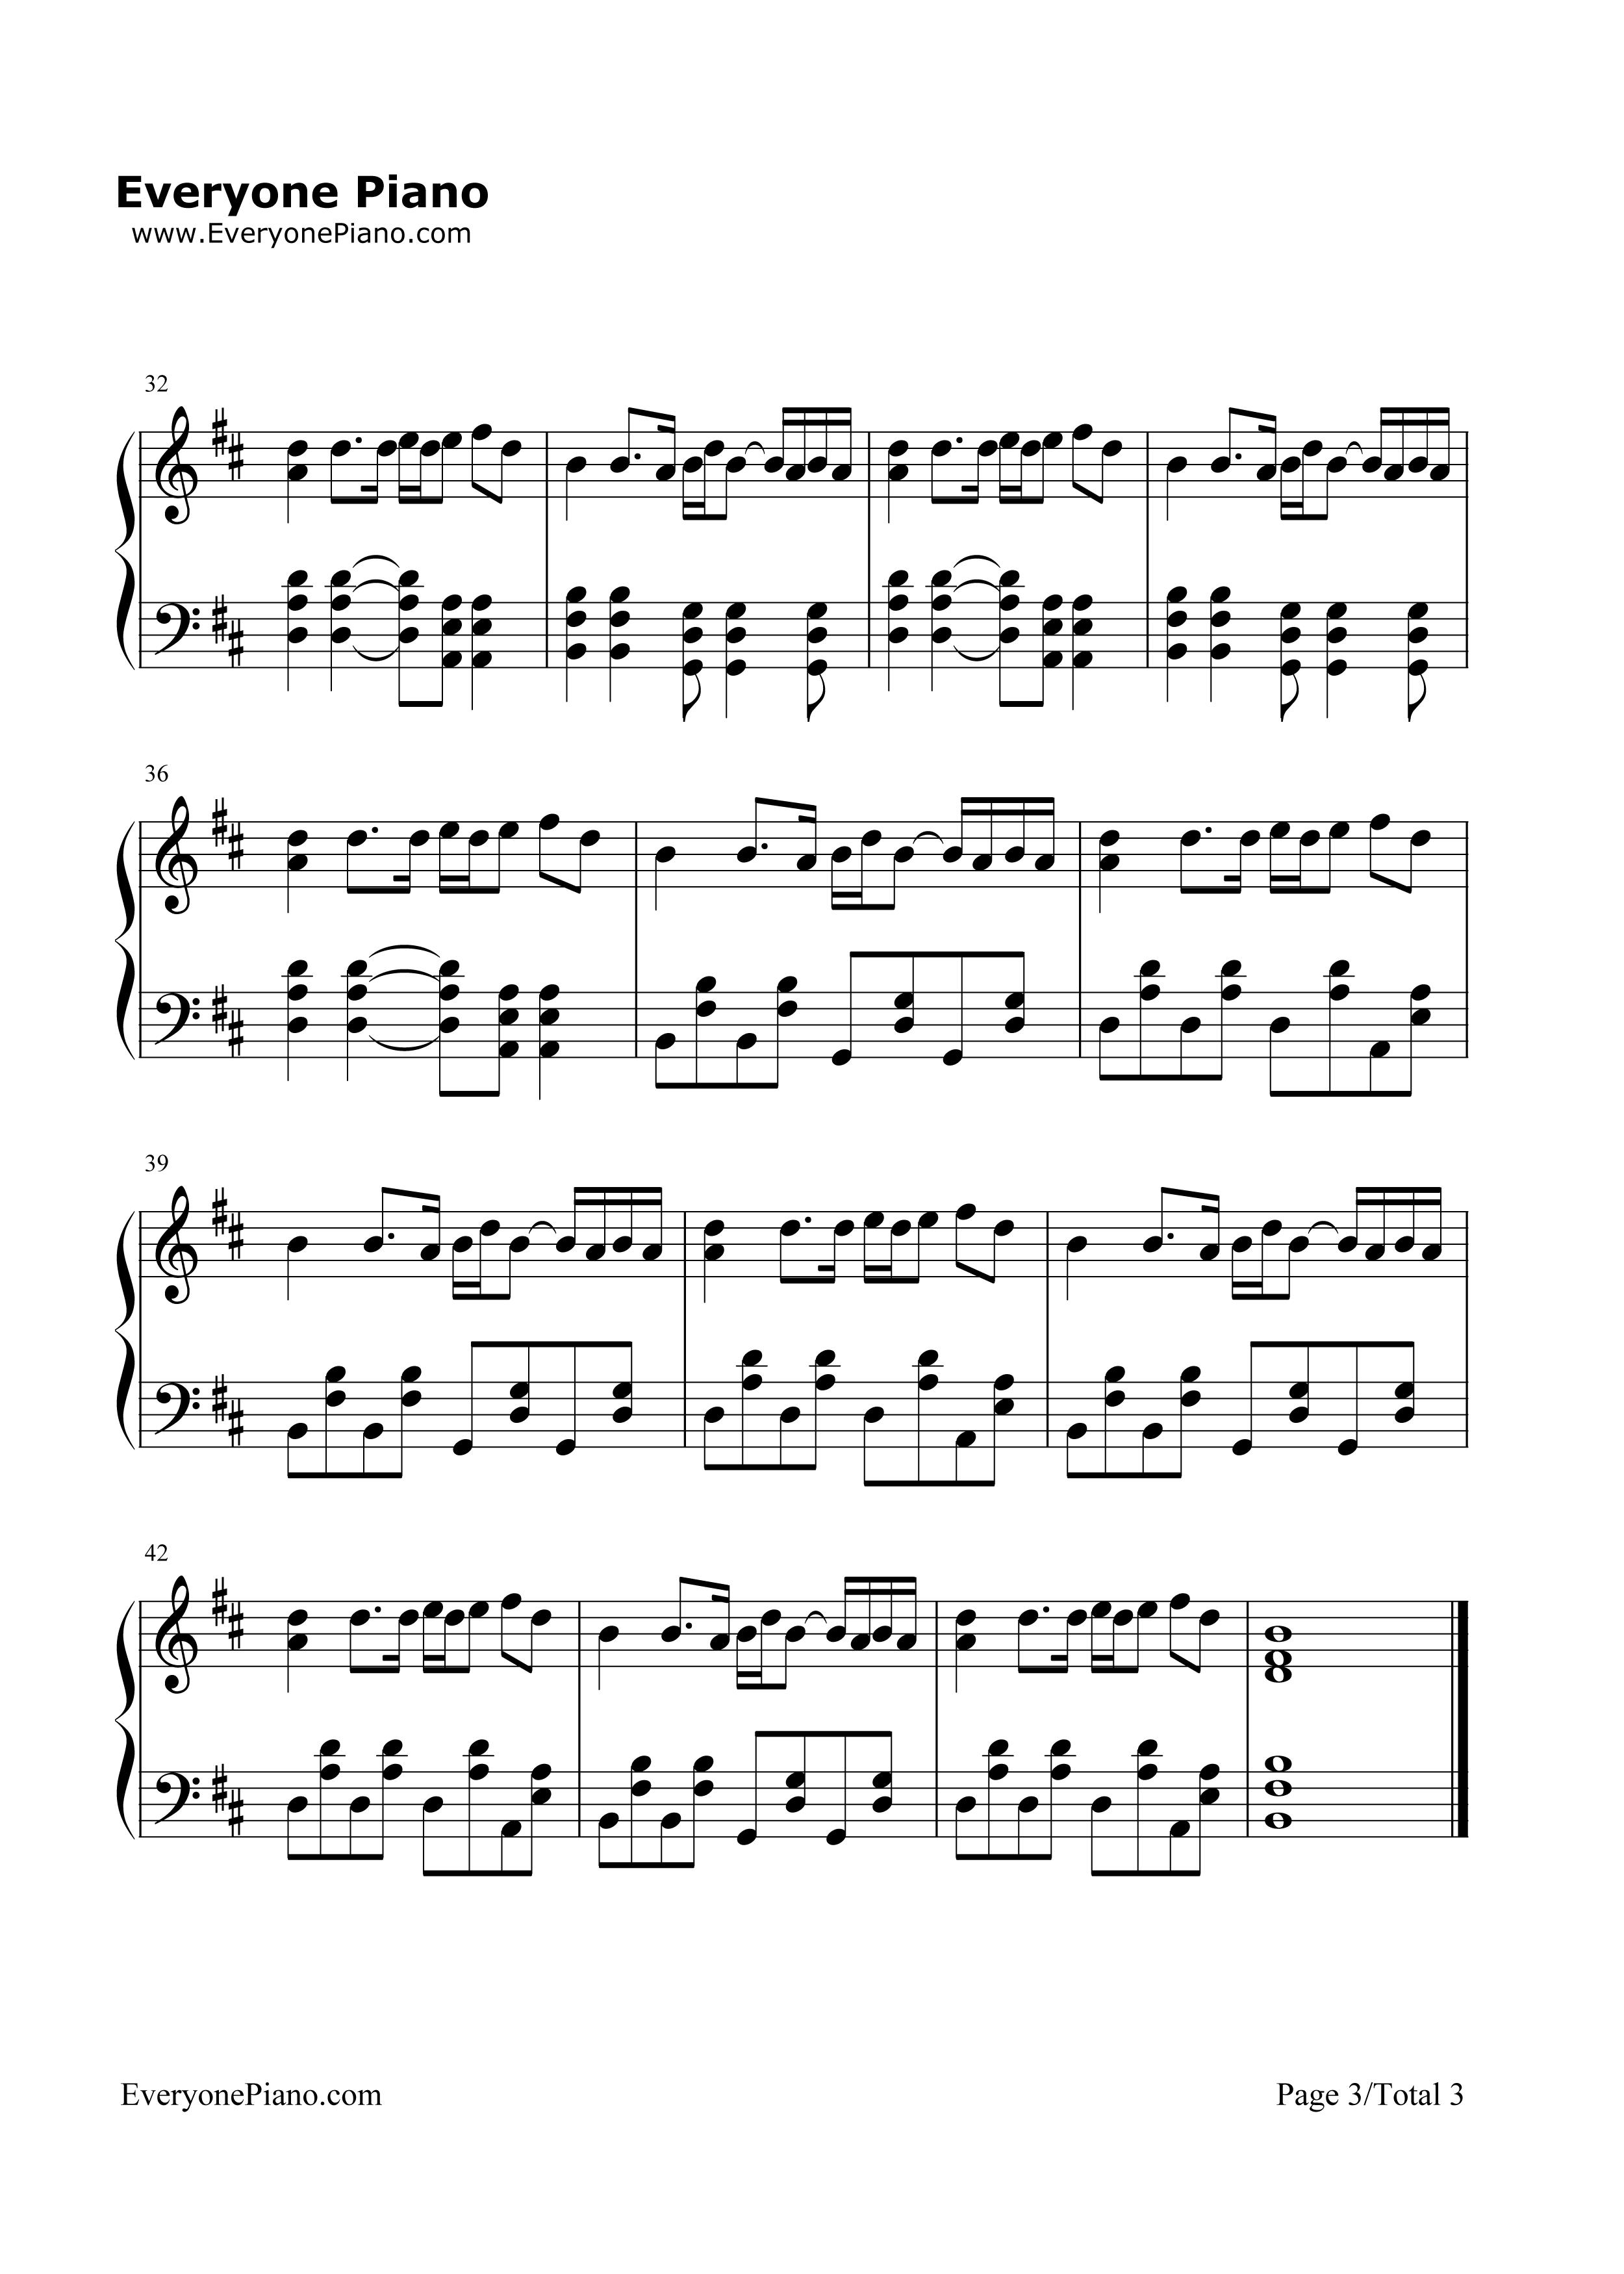 Wake me up avicii stave preview 3 free piano sheet music piano listen now print sheet wake me up avicii stave preview 3 hexwebz Gallery